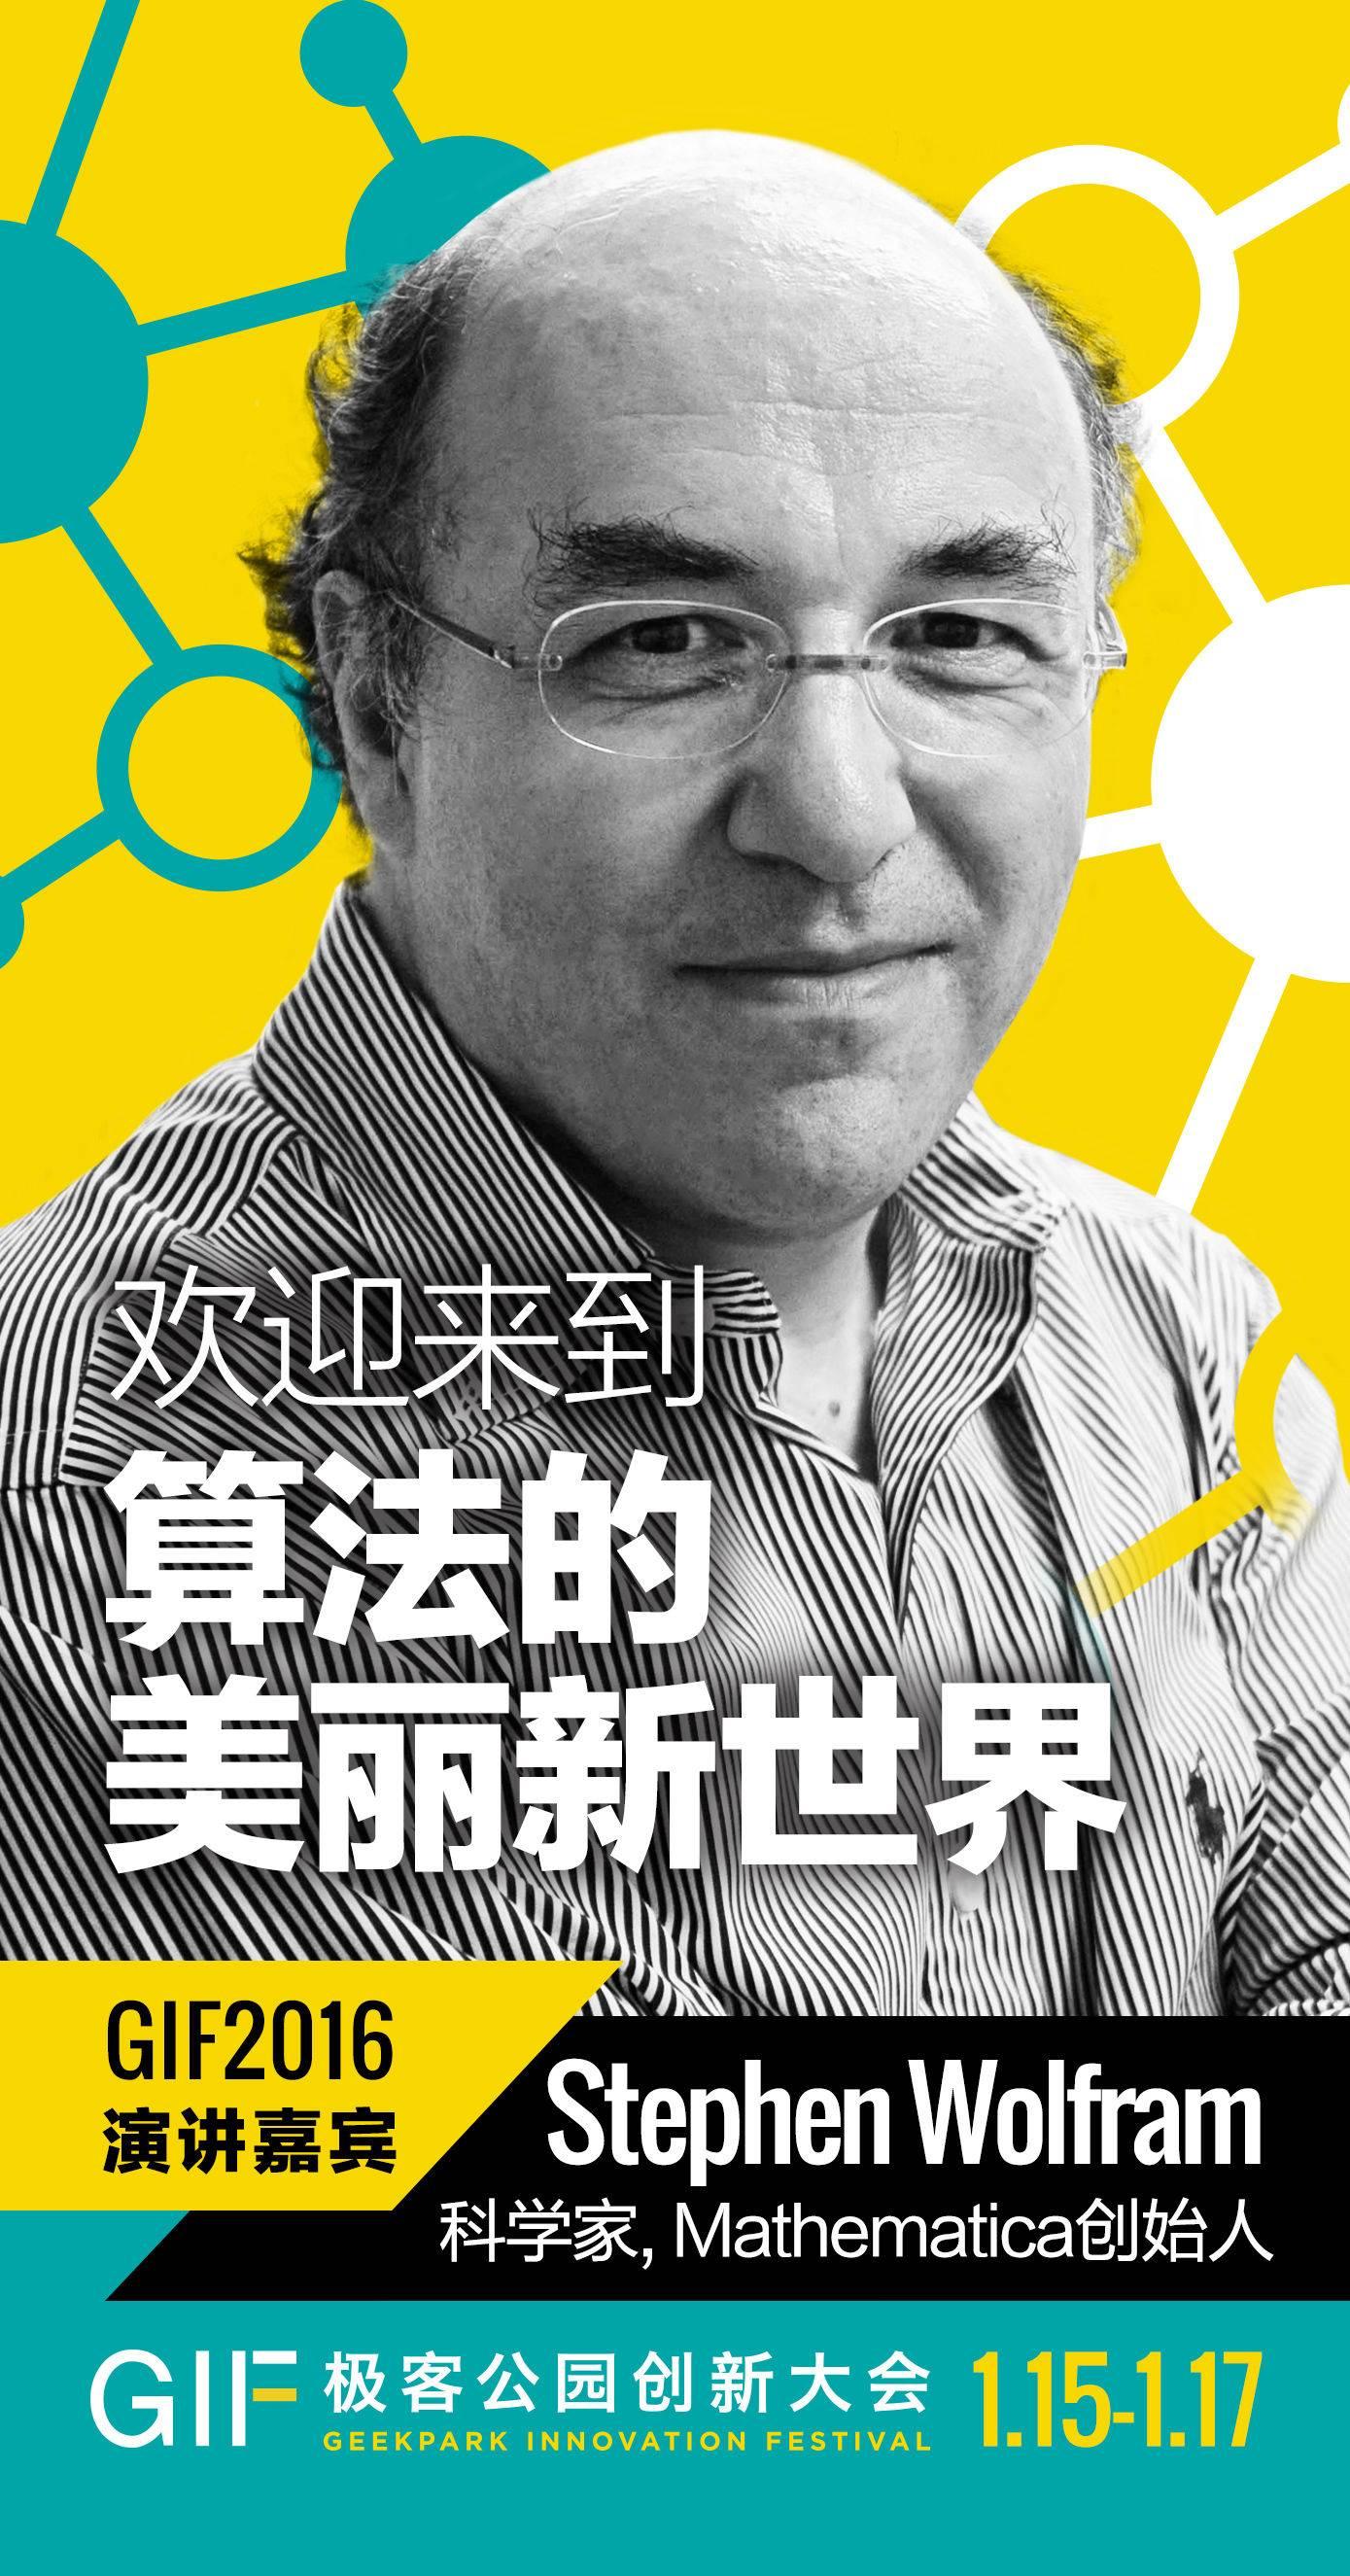 Stephen-Wolfram.jpg